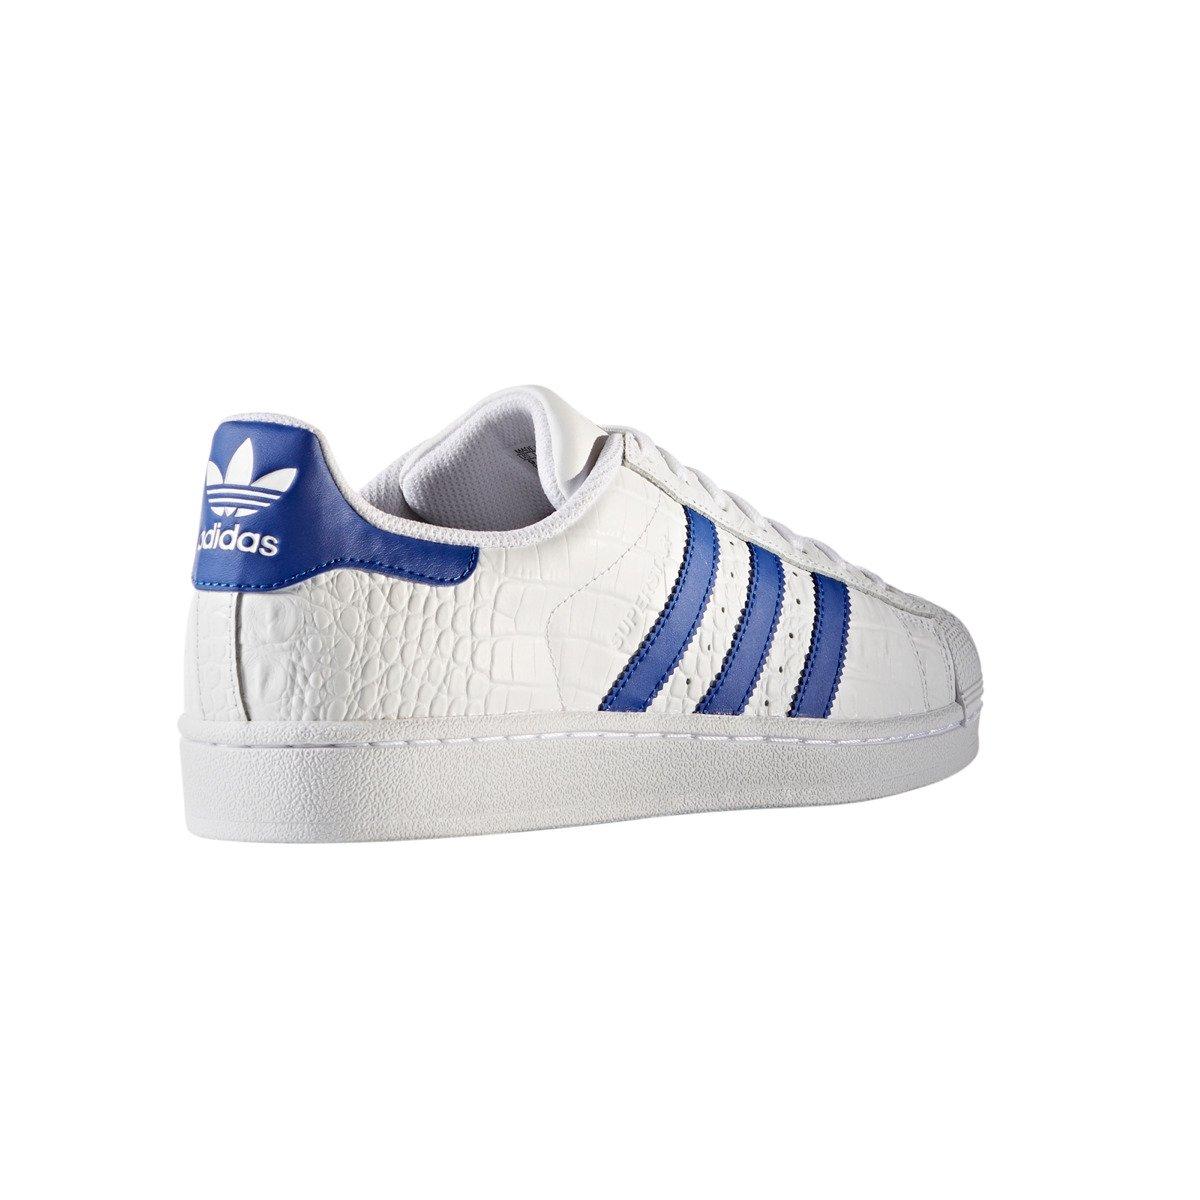 Basket adidas Originals Superstar - Ref. BZ0197 Pp5ljeUm